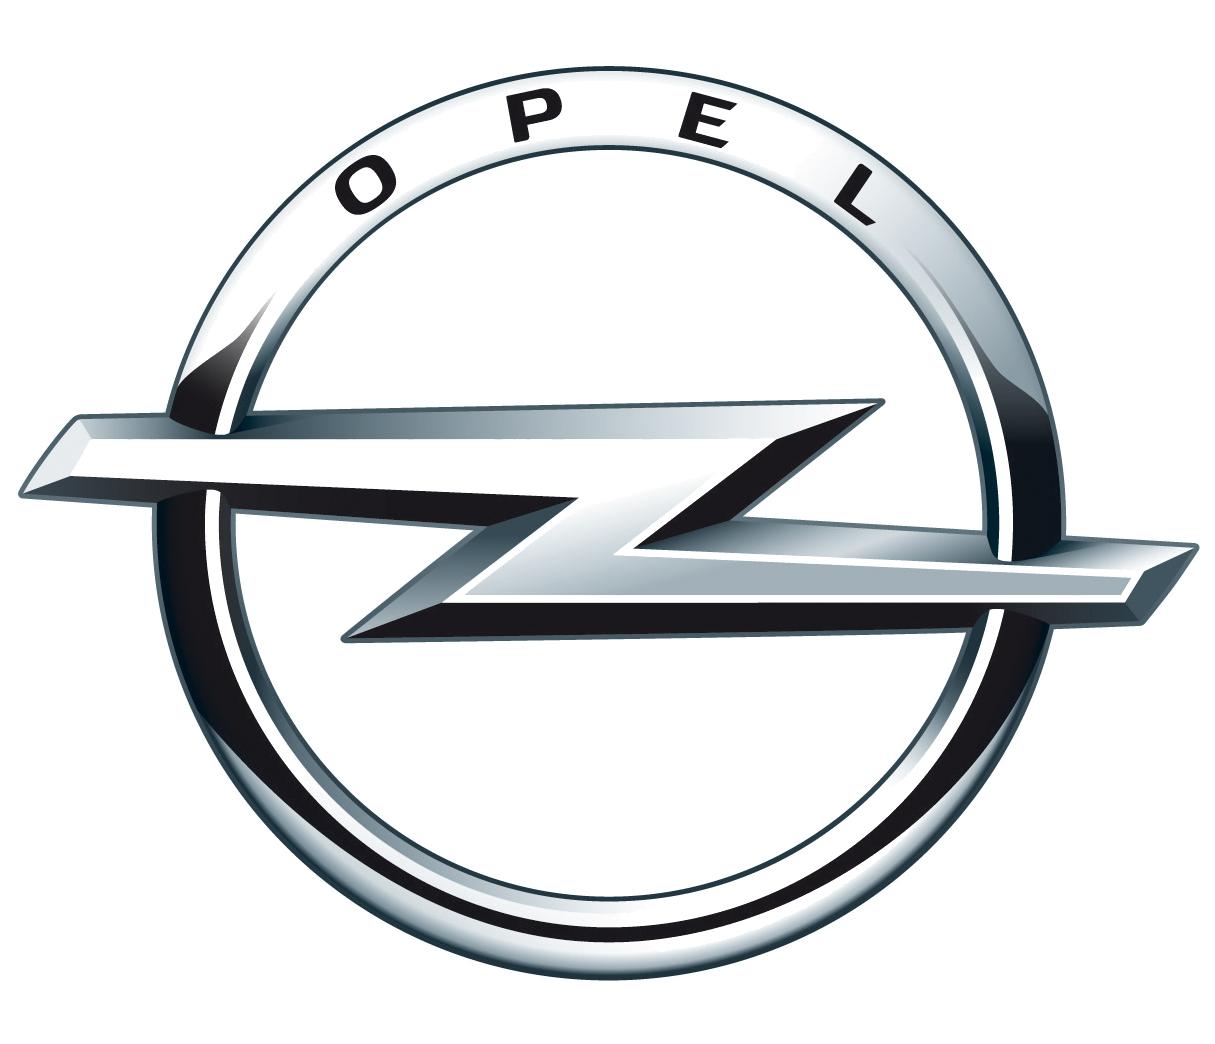 Opel Car Logo PNG Image